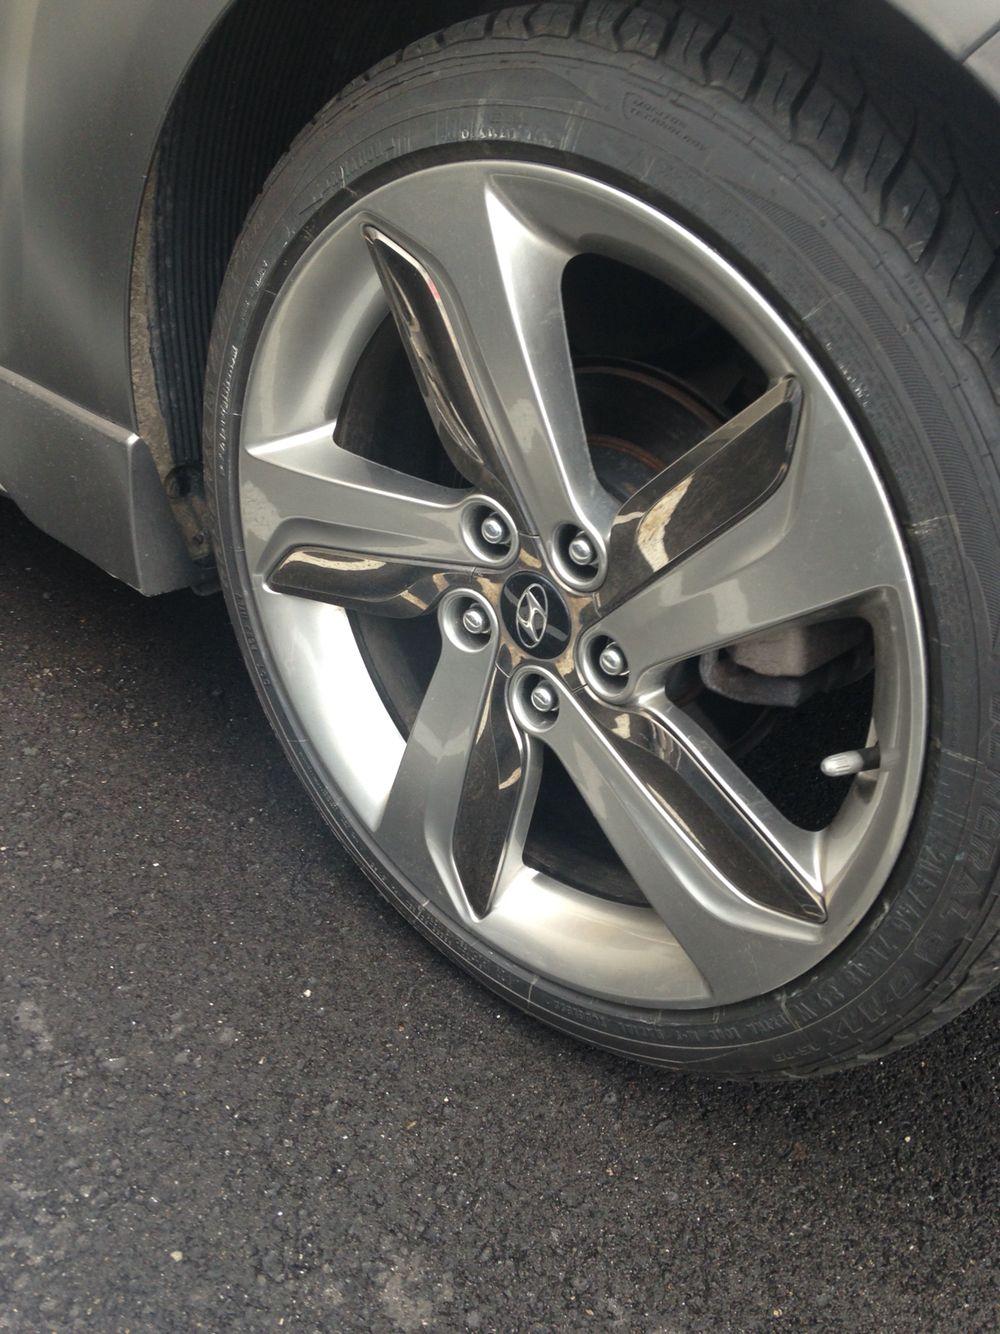 Wheel I guess